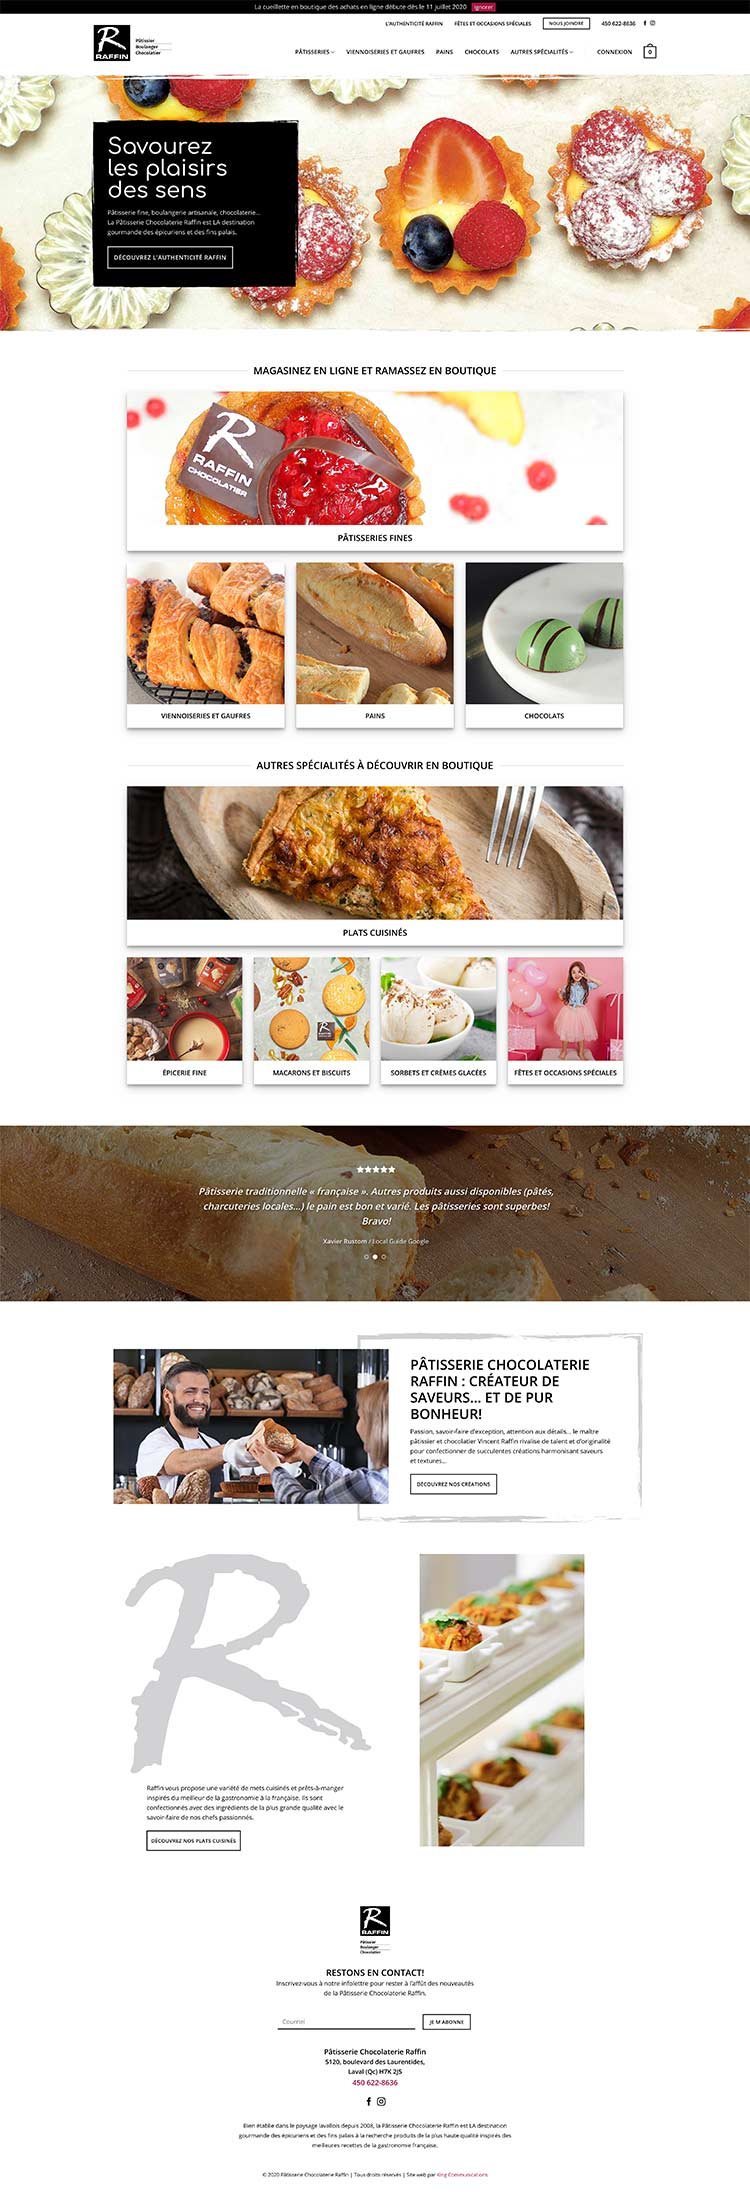 King Communications - Agence - Pâtisserie Raffin